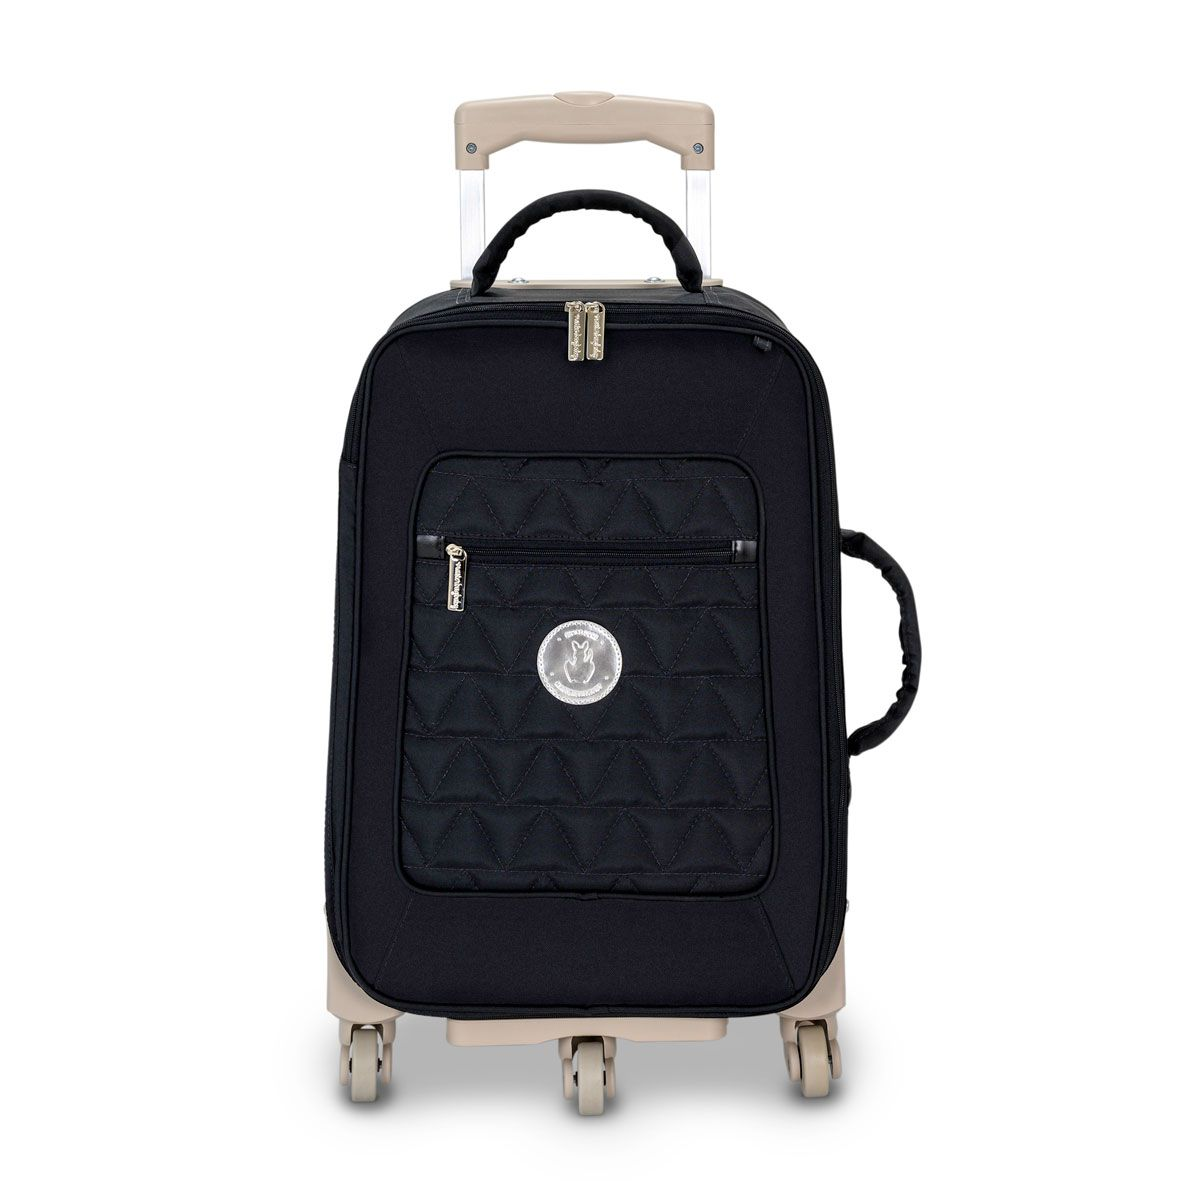 Mala Rodinha 1 Compartimento Preta / Prata - Masterbag Ref 11NYL405